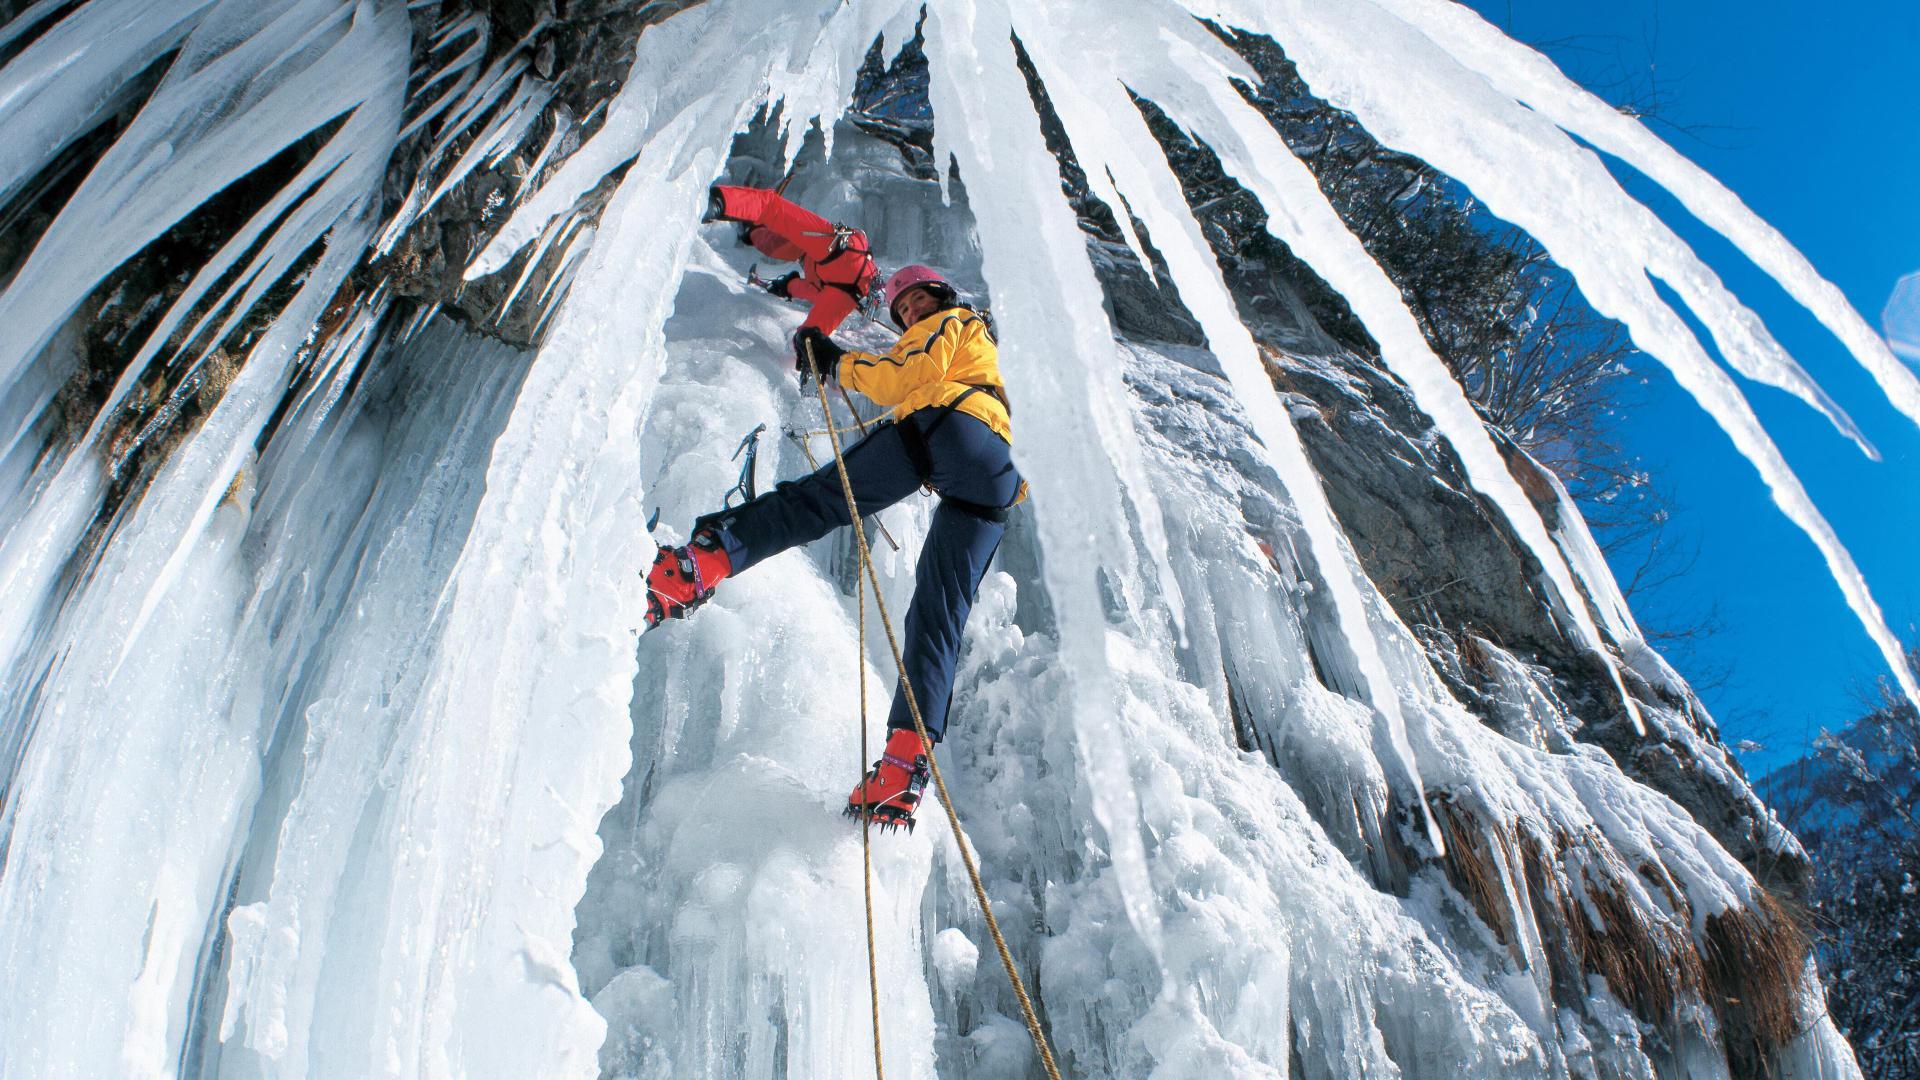 fantasy Ice climbing image